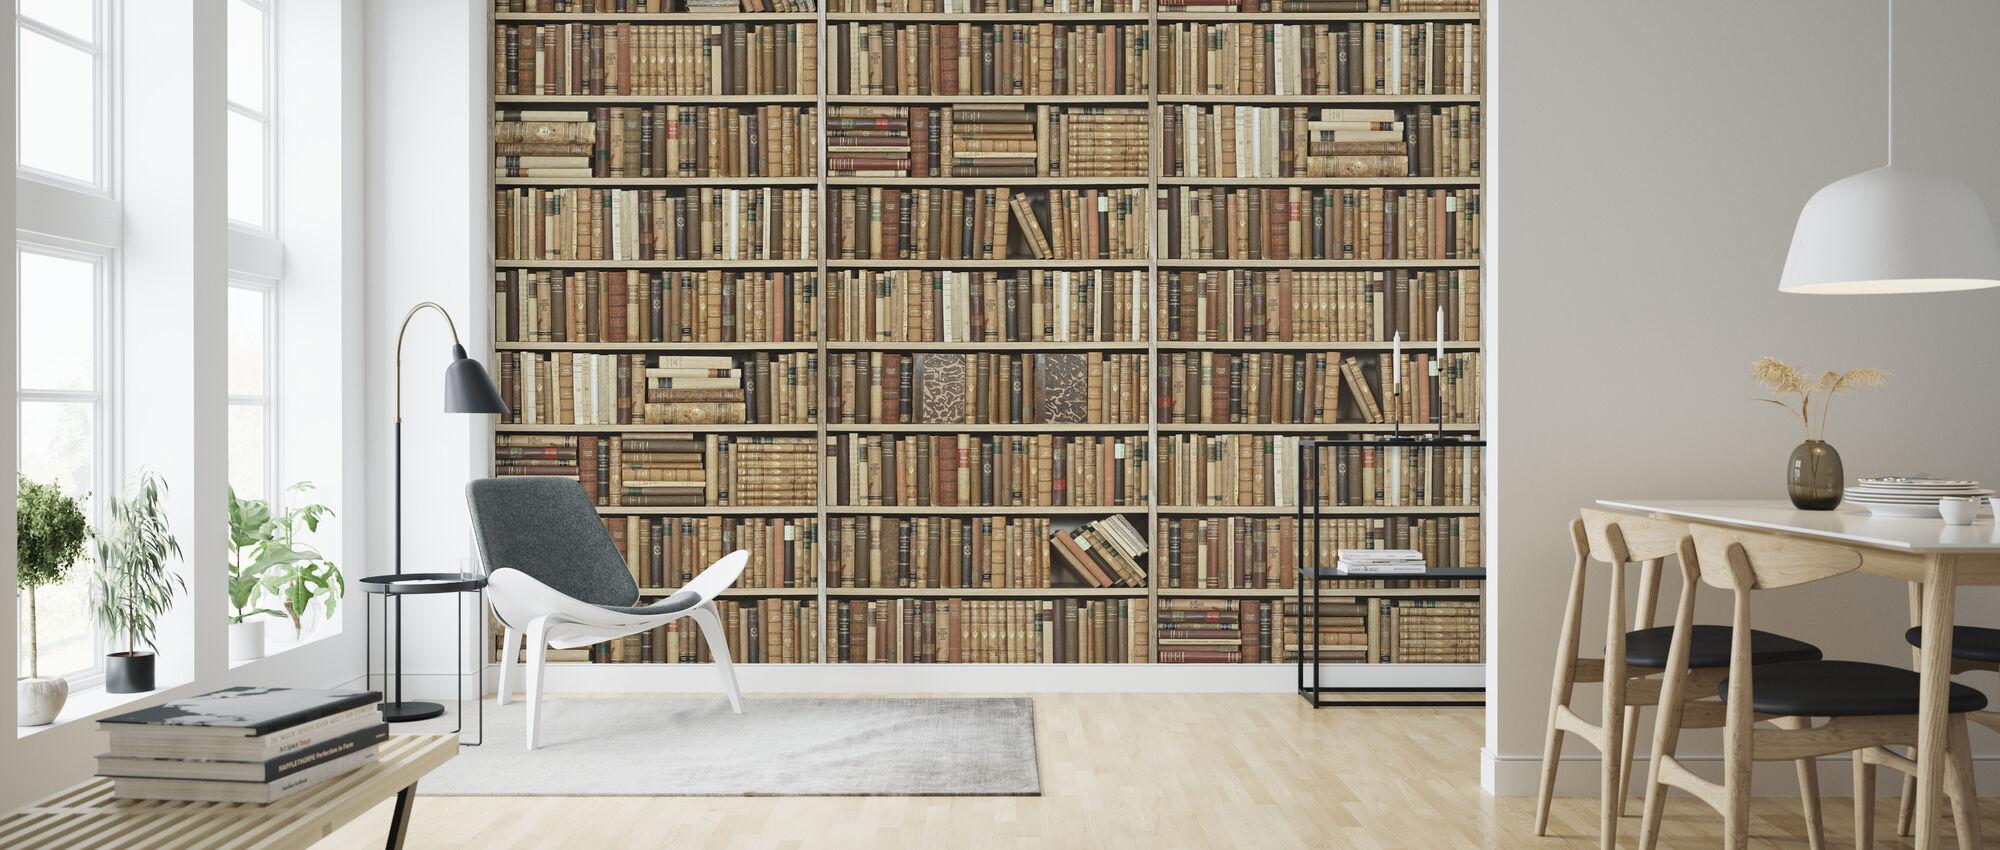 Bookshelf - Wooden - Beige - Wallpaper - Living Room